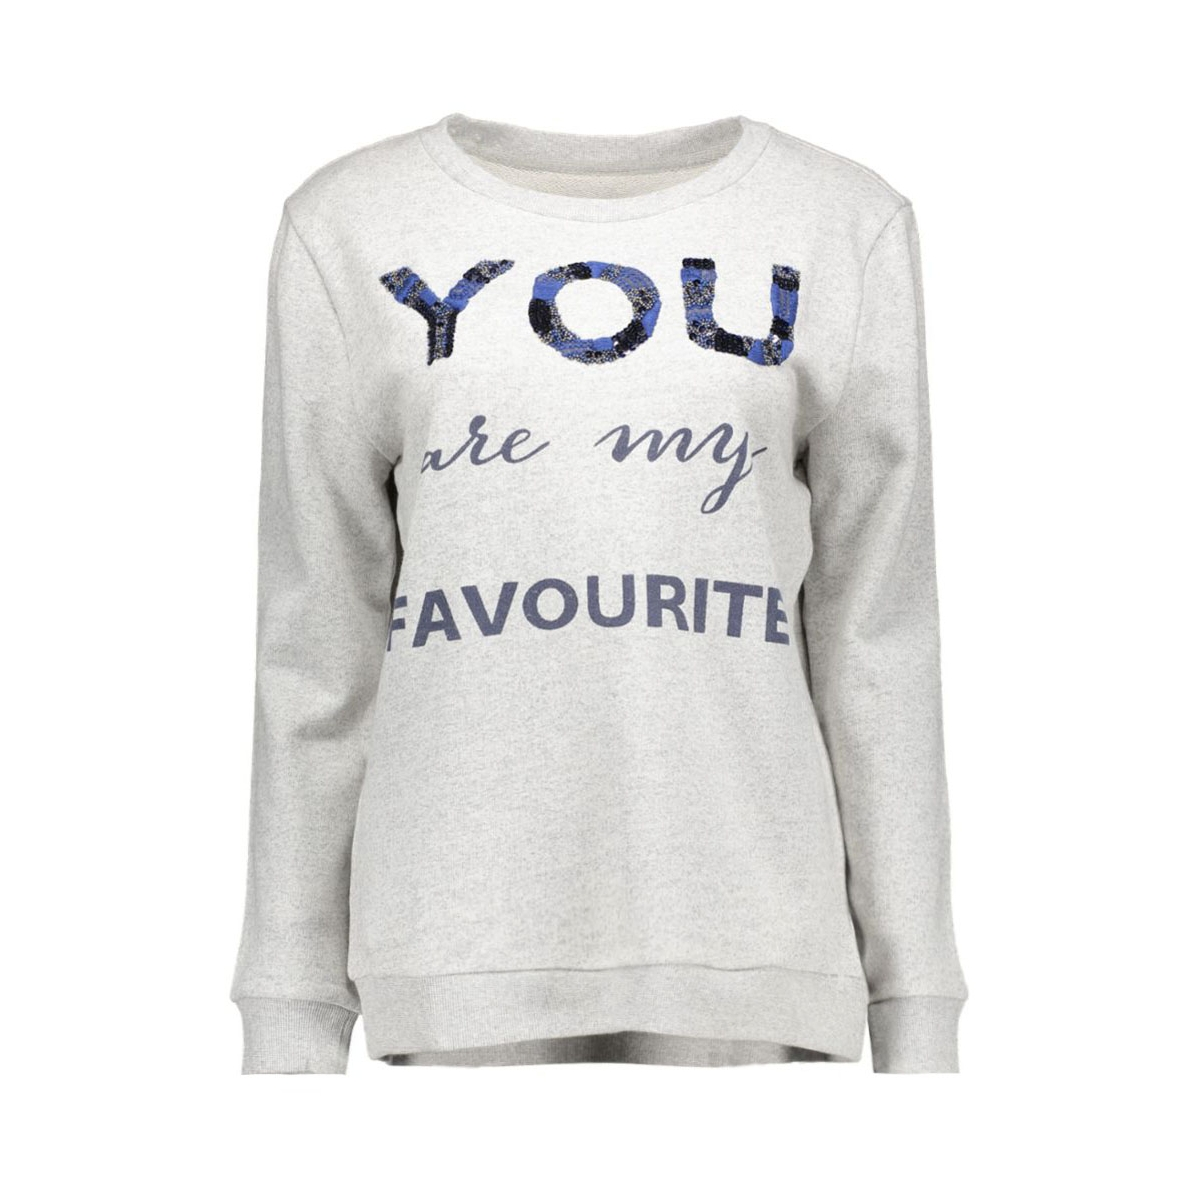 086cc1j021 edc sweater c044